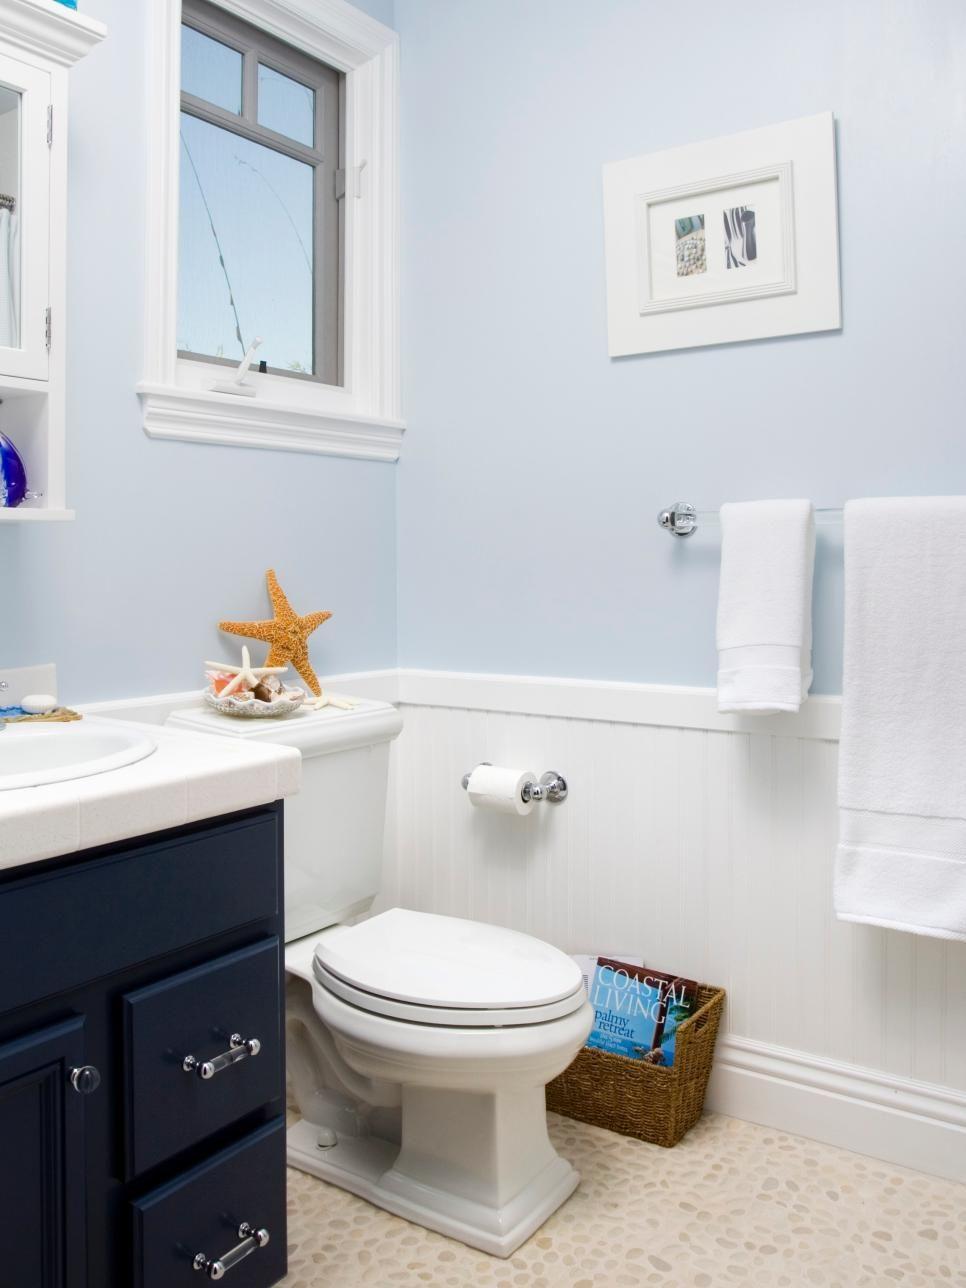 12 Designer Bathrooms for Less | Pinterest | Beach themed bathrooms ...